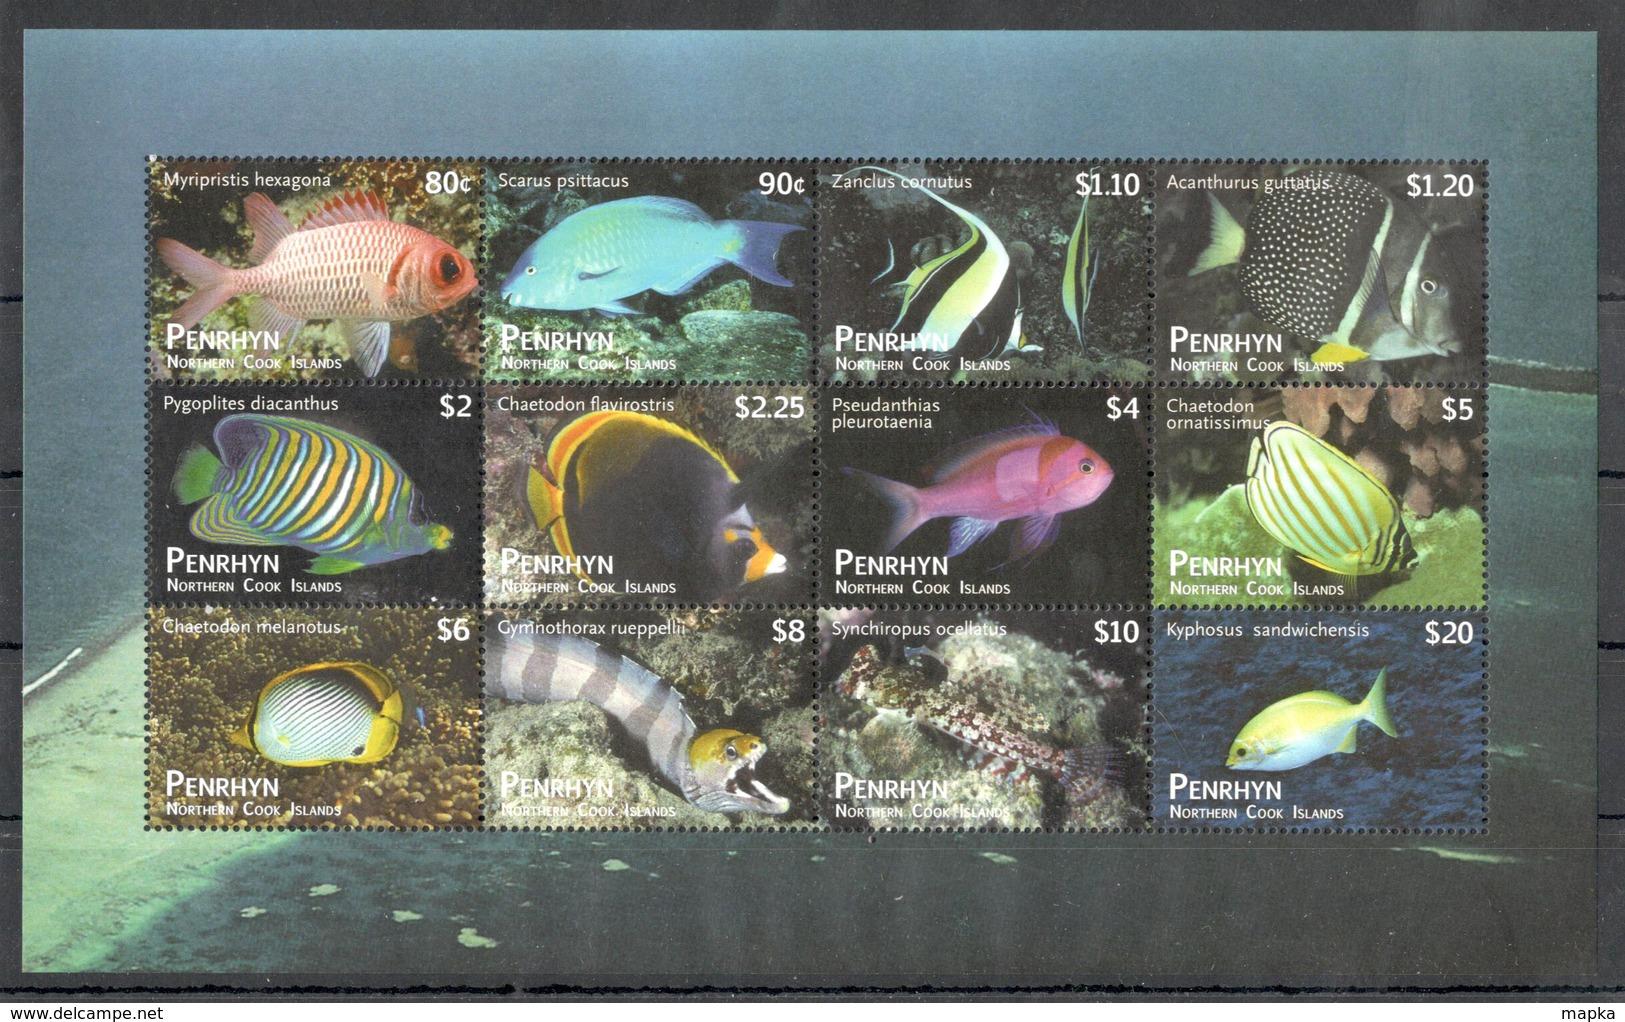 EC224 PENRHYN NORTHERN COOK ISLANDS MARINE LIFE FISH 1SH MICHEL 110 EURO MNH - Meereswelt